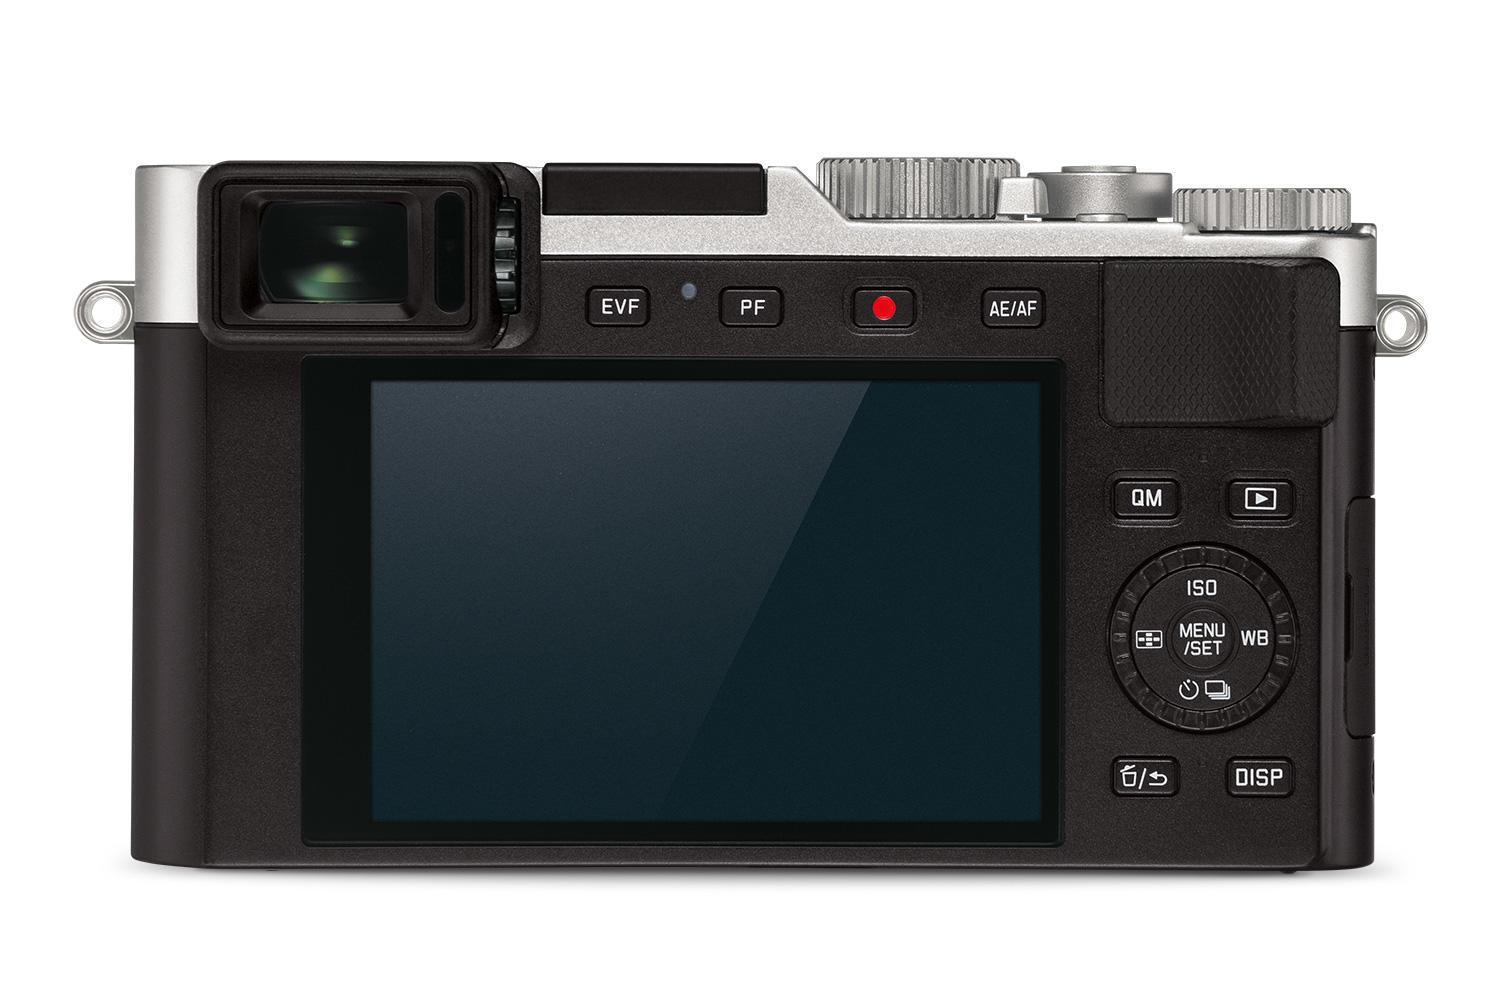 Leica-D-Lux-7-back-|-1512x1008-BG-ffffff_teaser-2632x1756